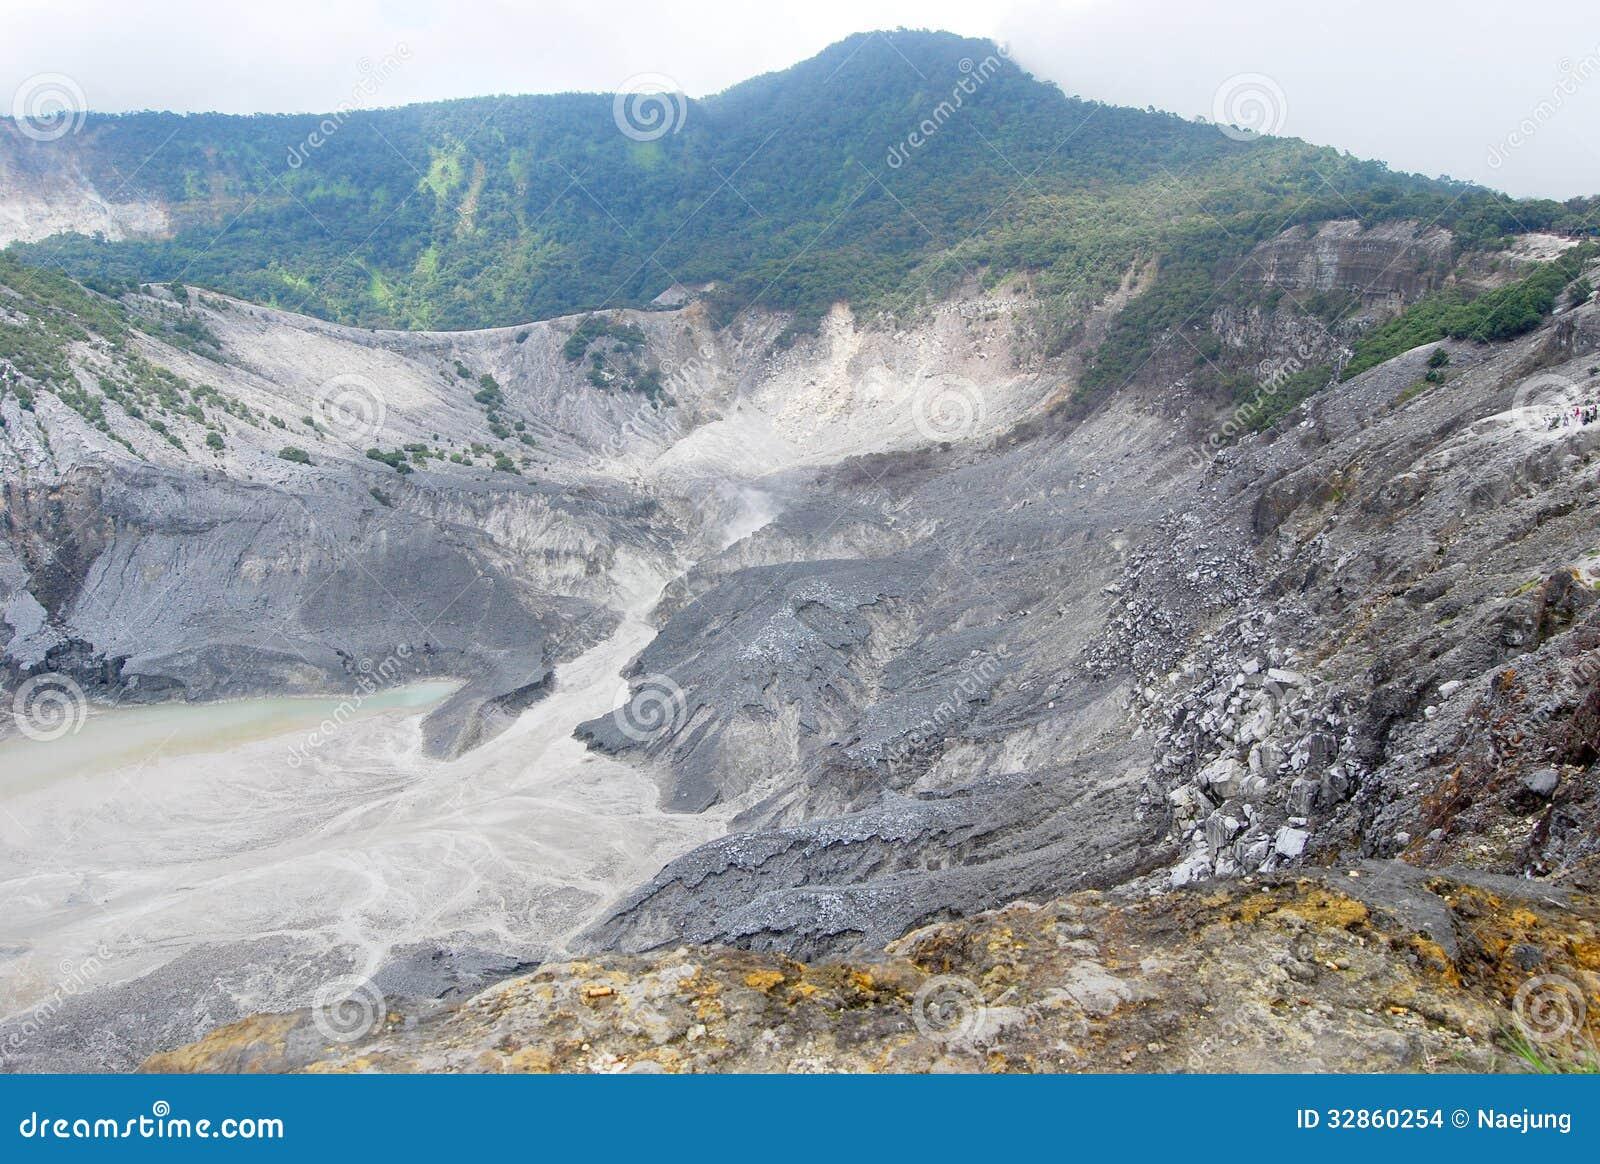 Volcan de Gunung Bartur